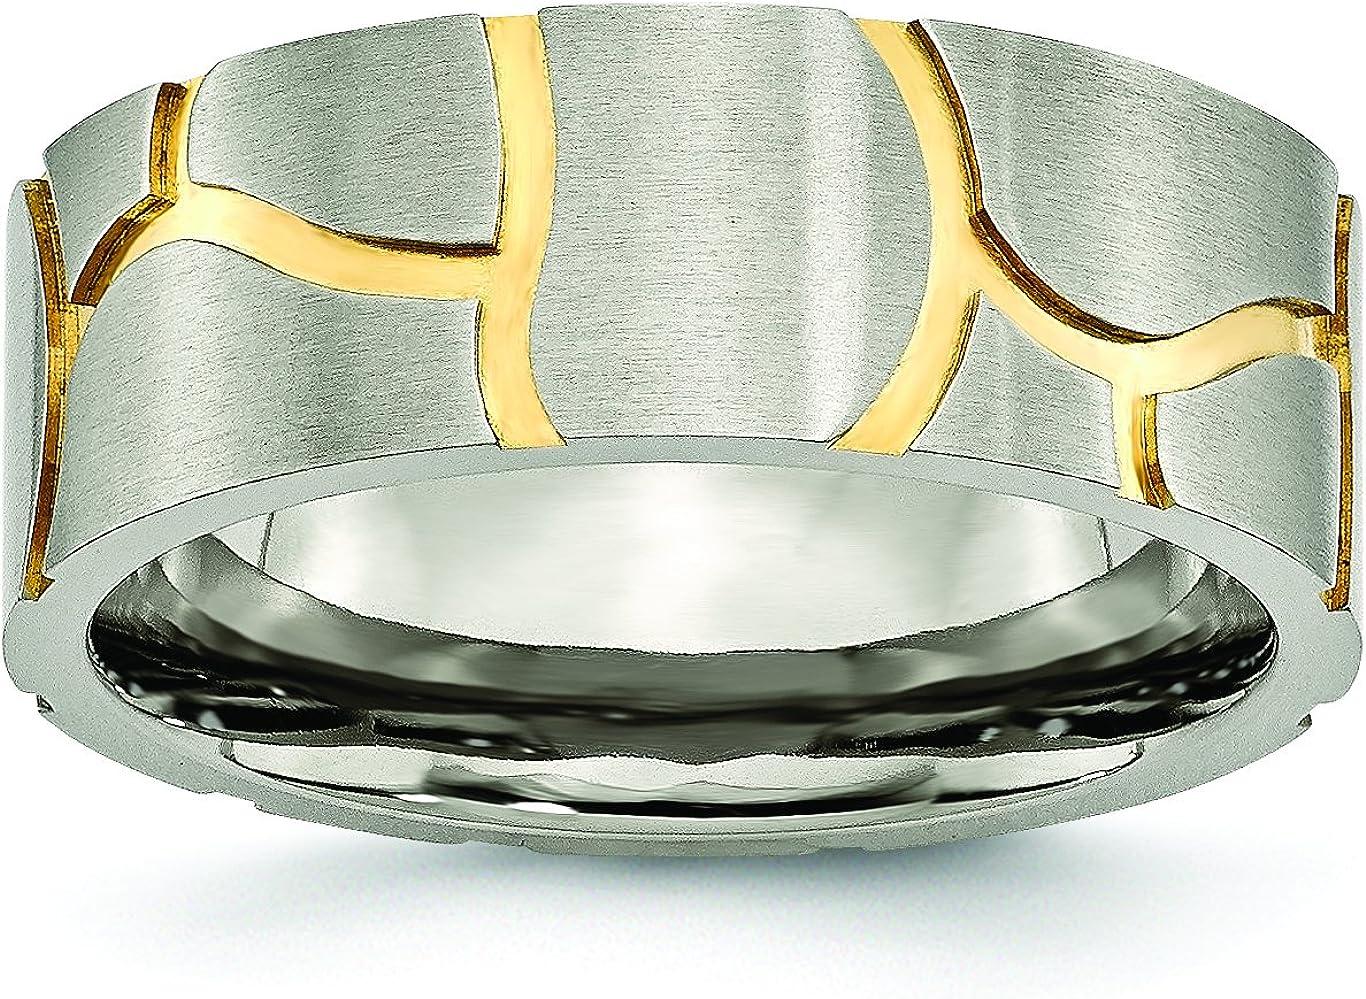 8mm Grooved Yellow Plated Brushed Finish Textured Designer Titanium Wedding Band